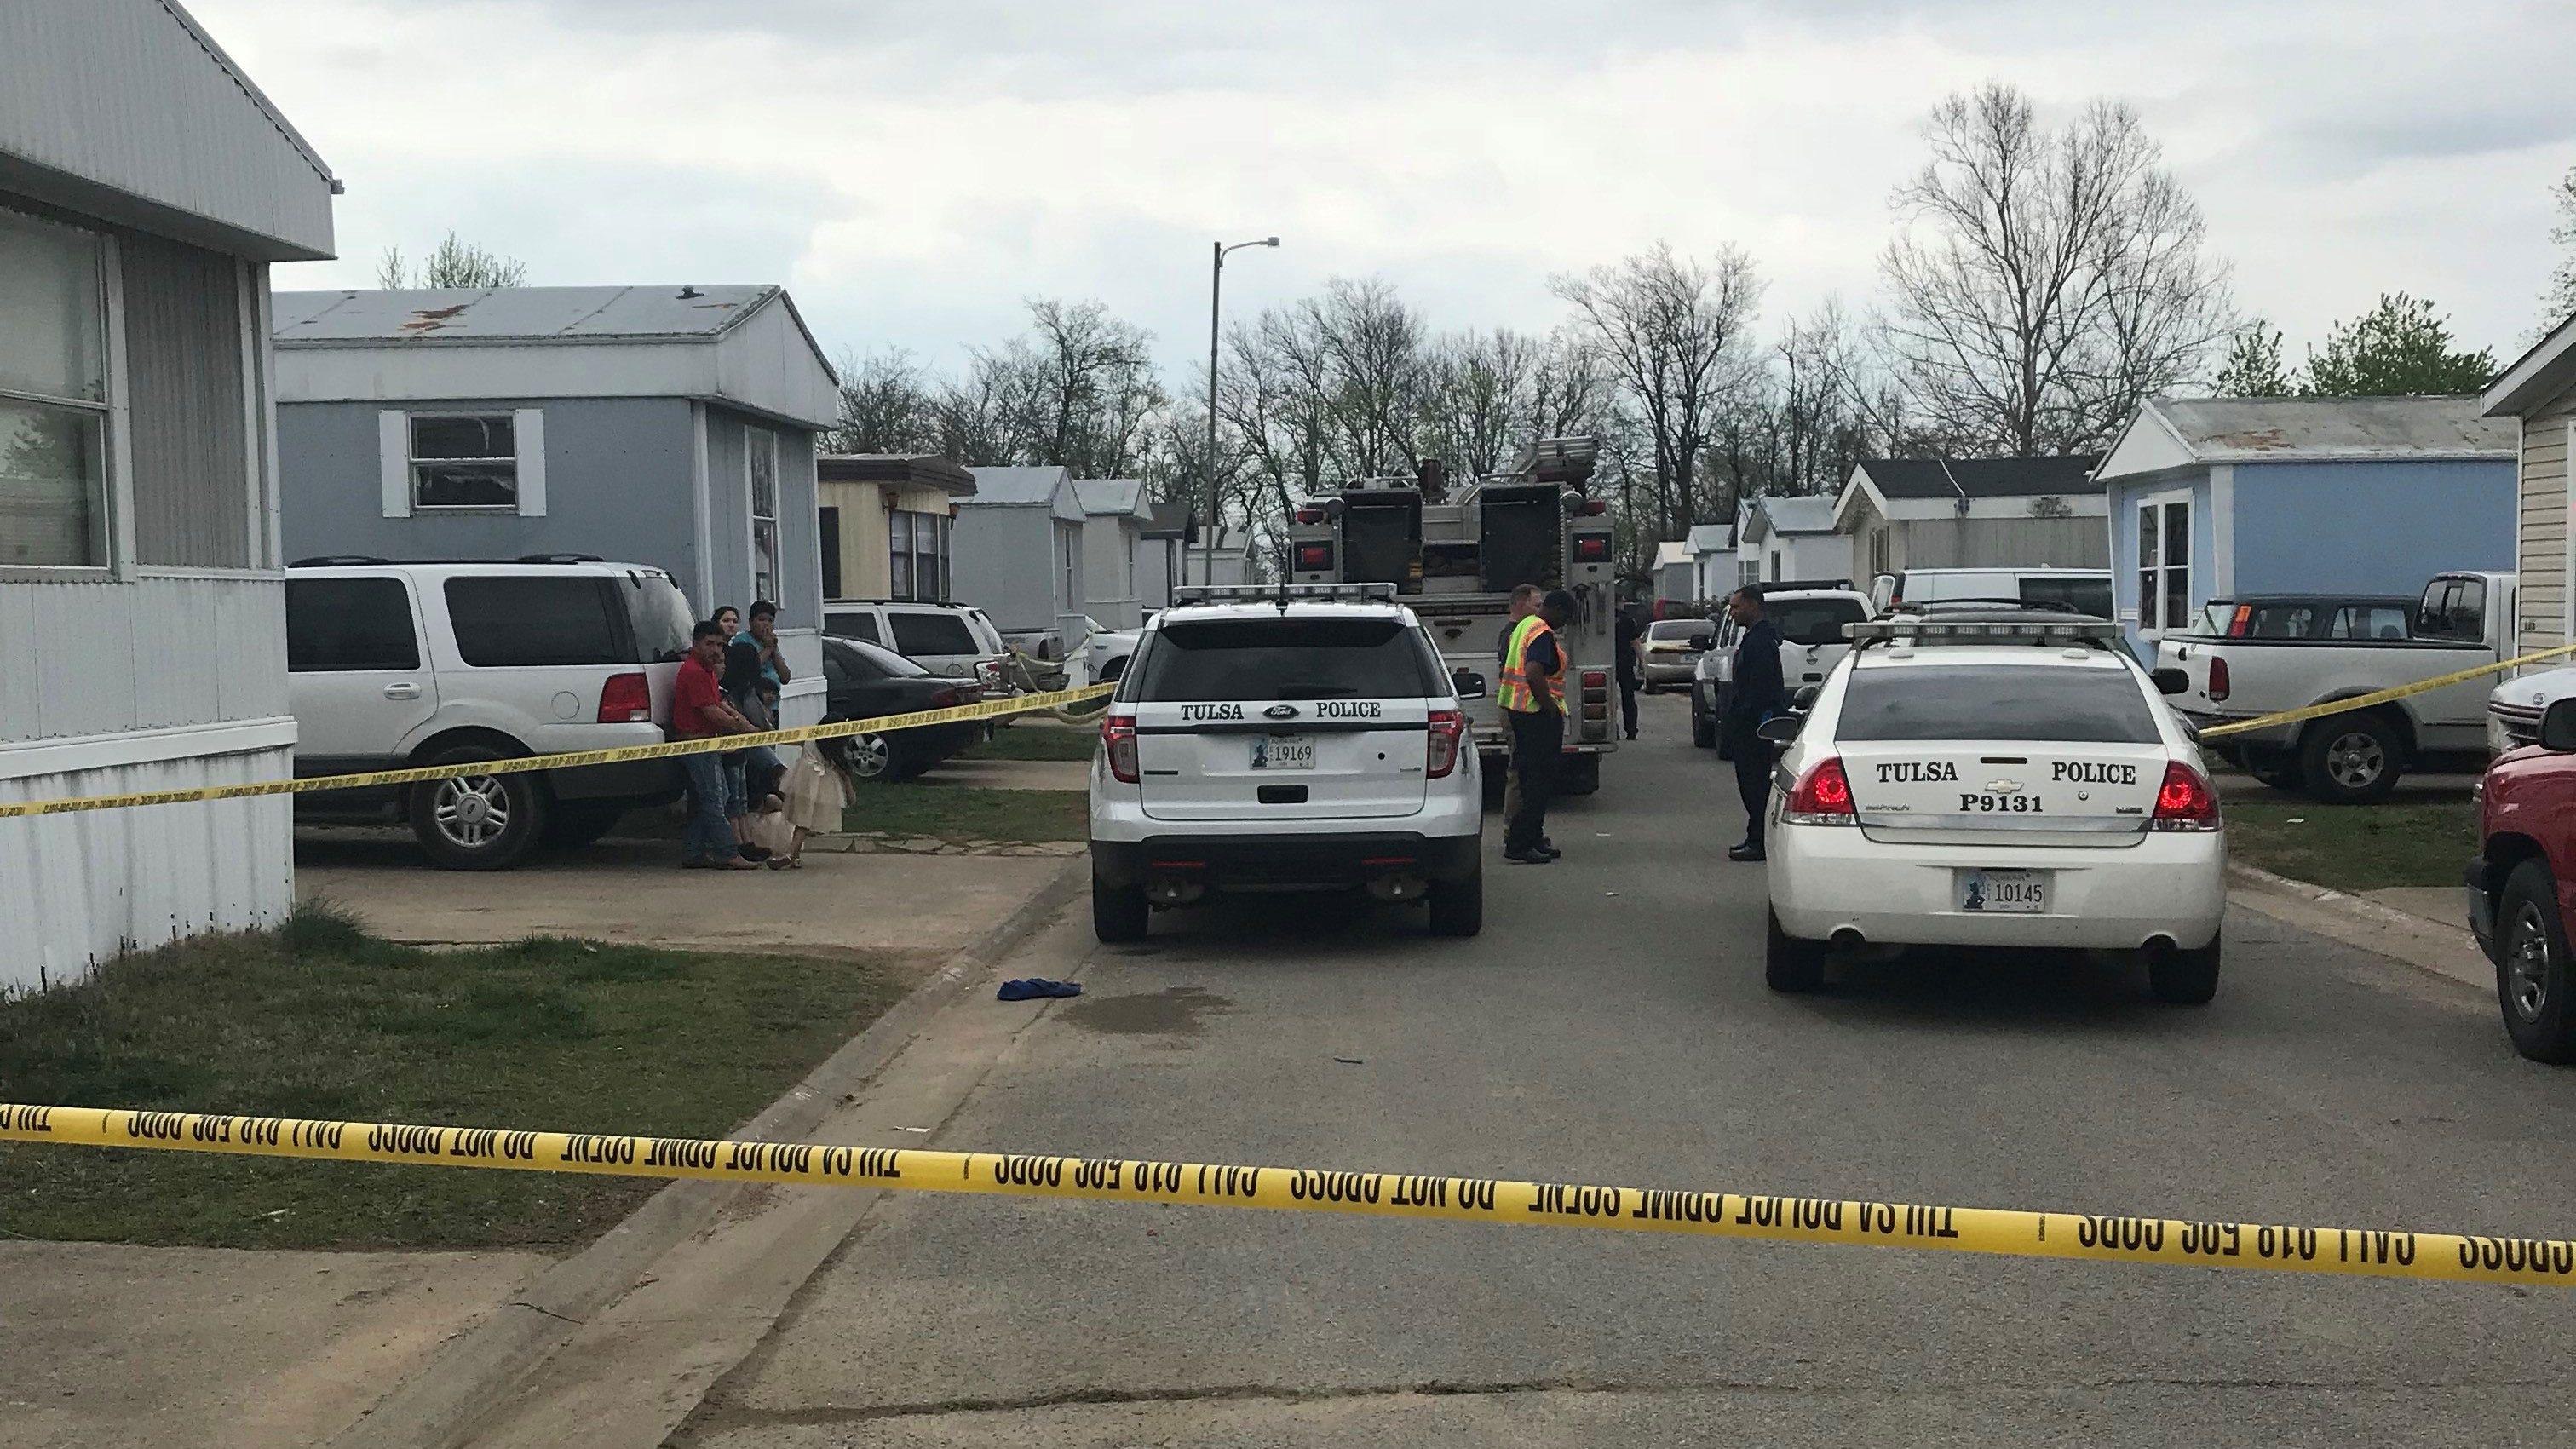 Family Member Runs Over, Kills 2-Year-Old Boy, TPD Says